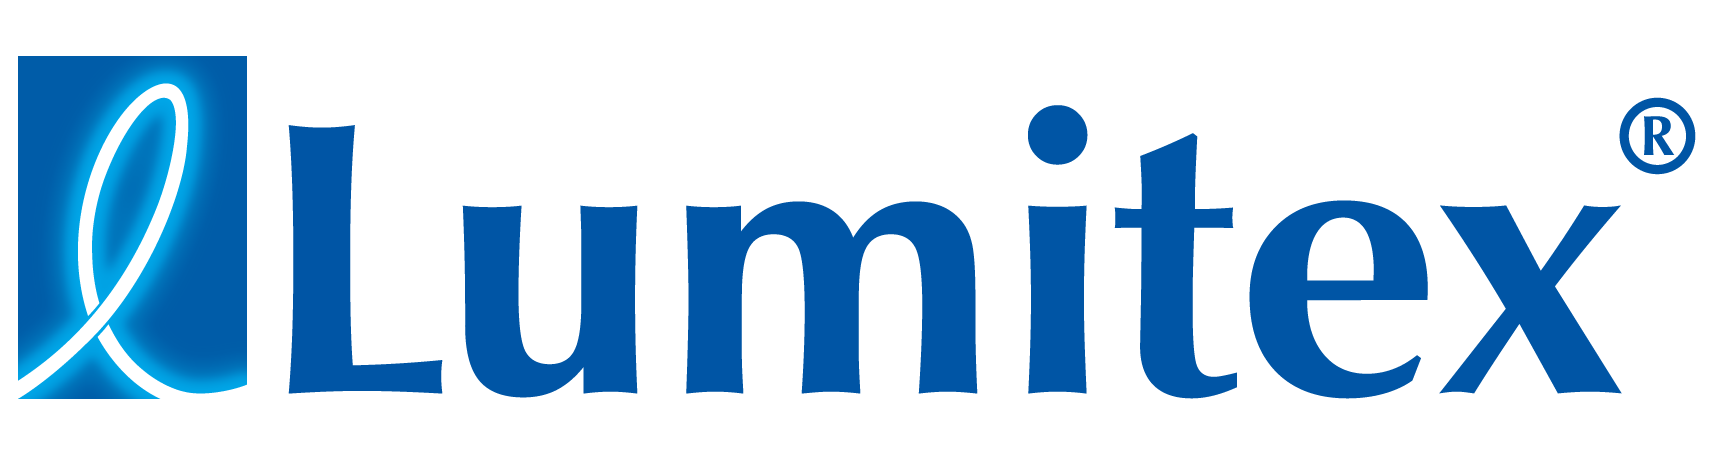 lumitex-web-logo-blue.png